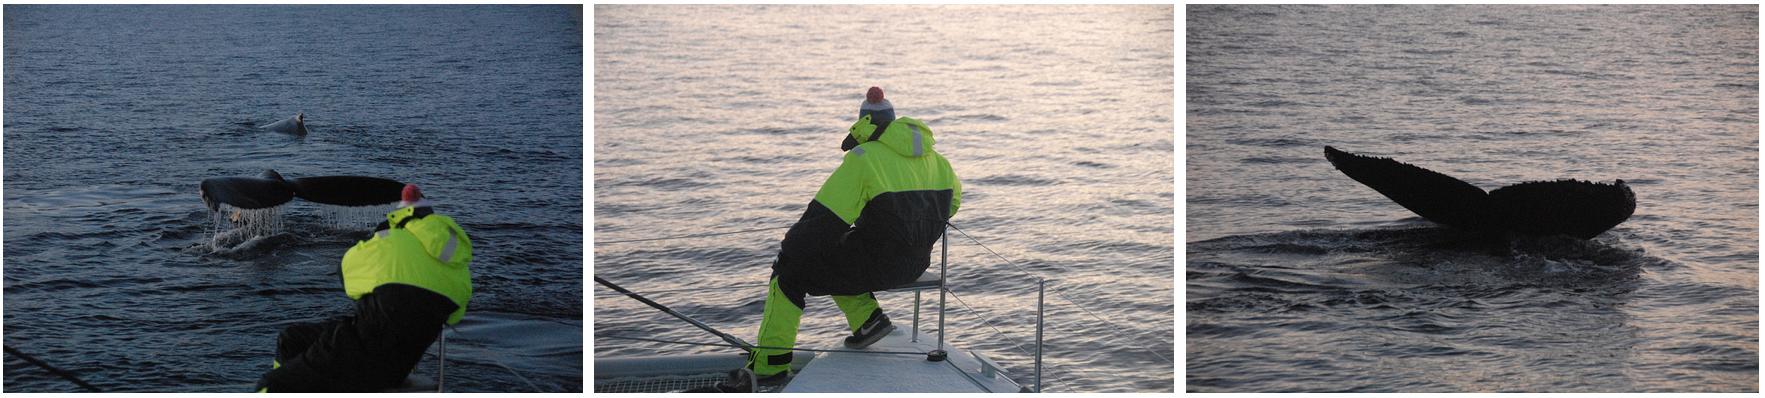 Whalesafari Whalewatching Tromsø Arctic Princess